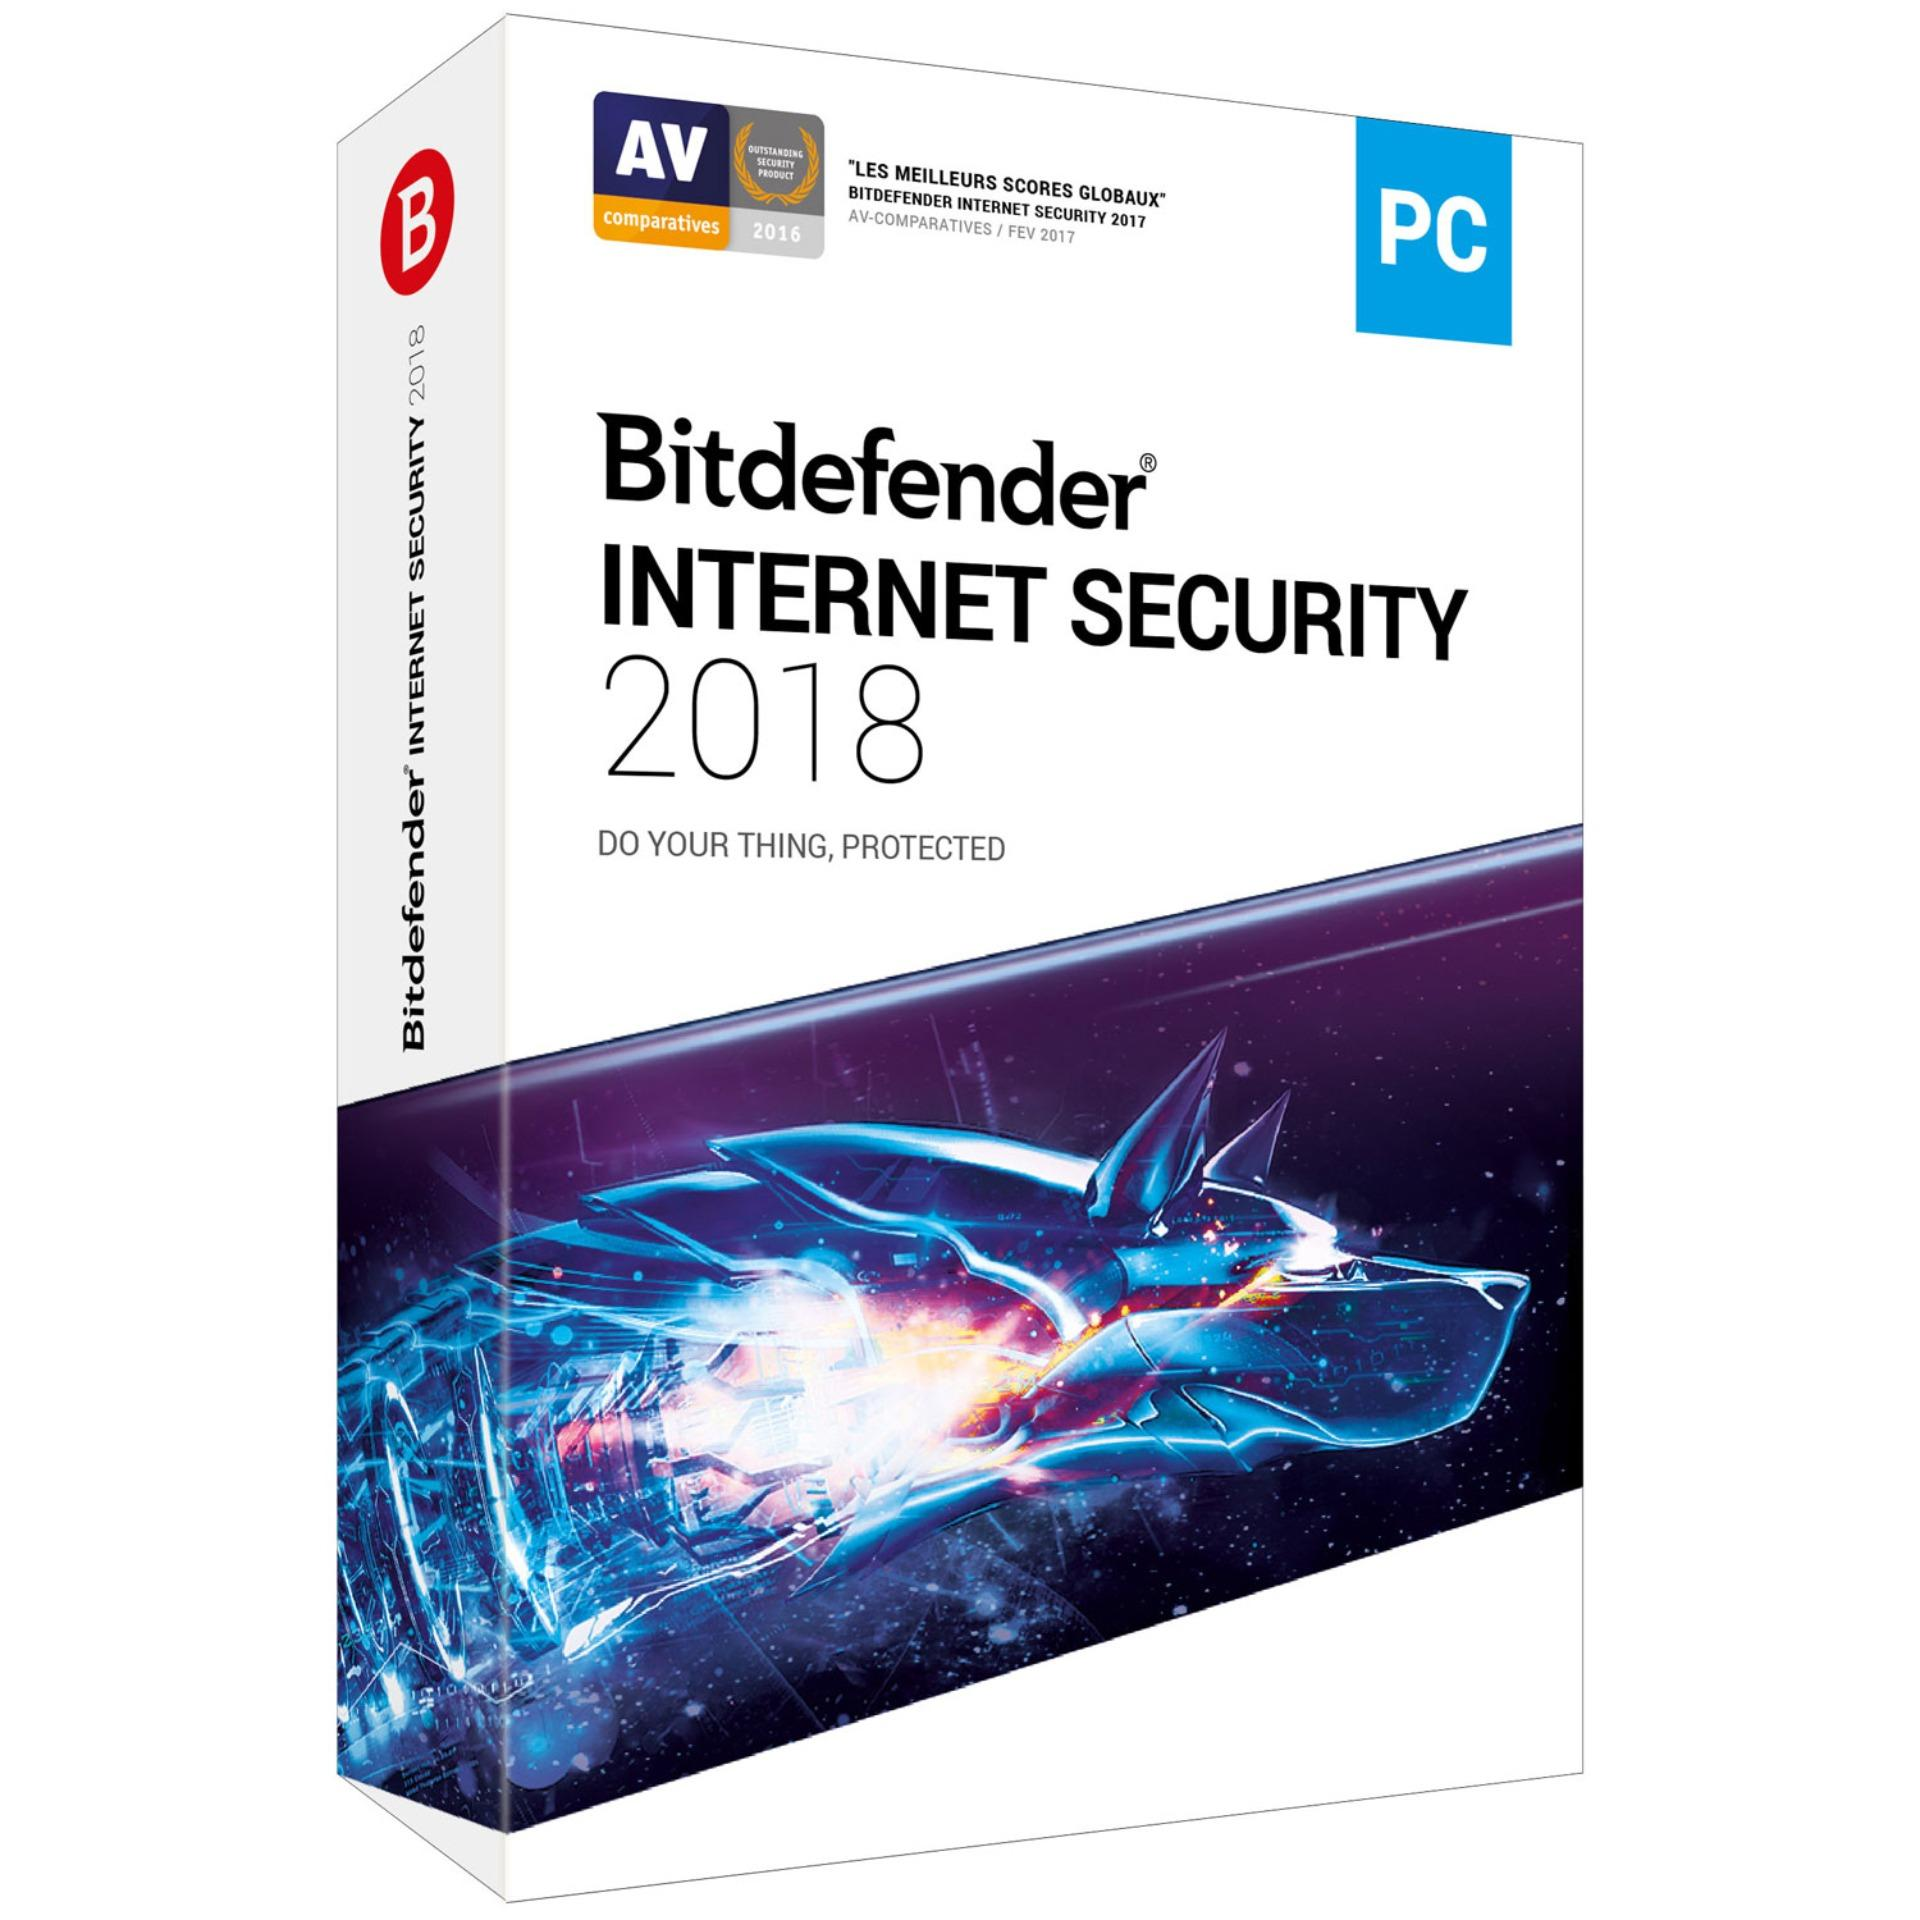 Phần mềm diệt virus Bitdefender Internet Security 2018